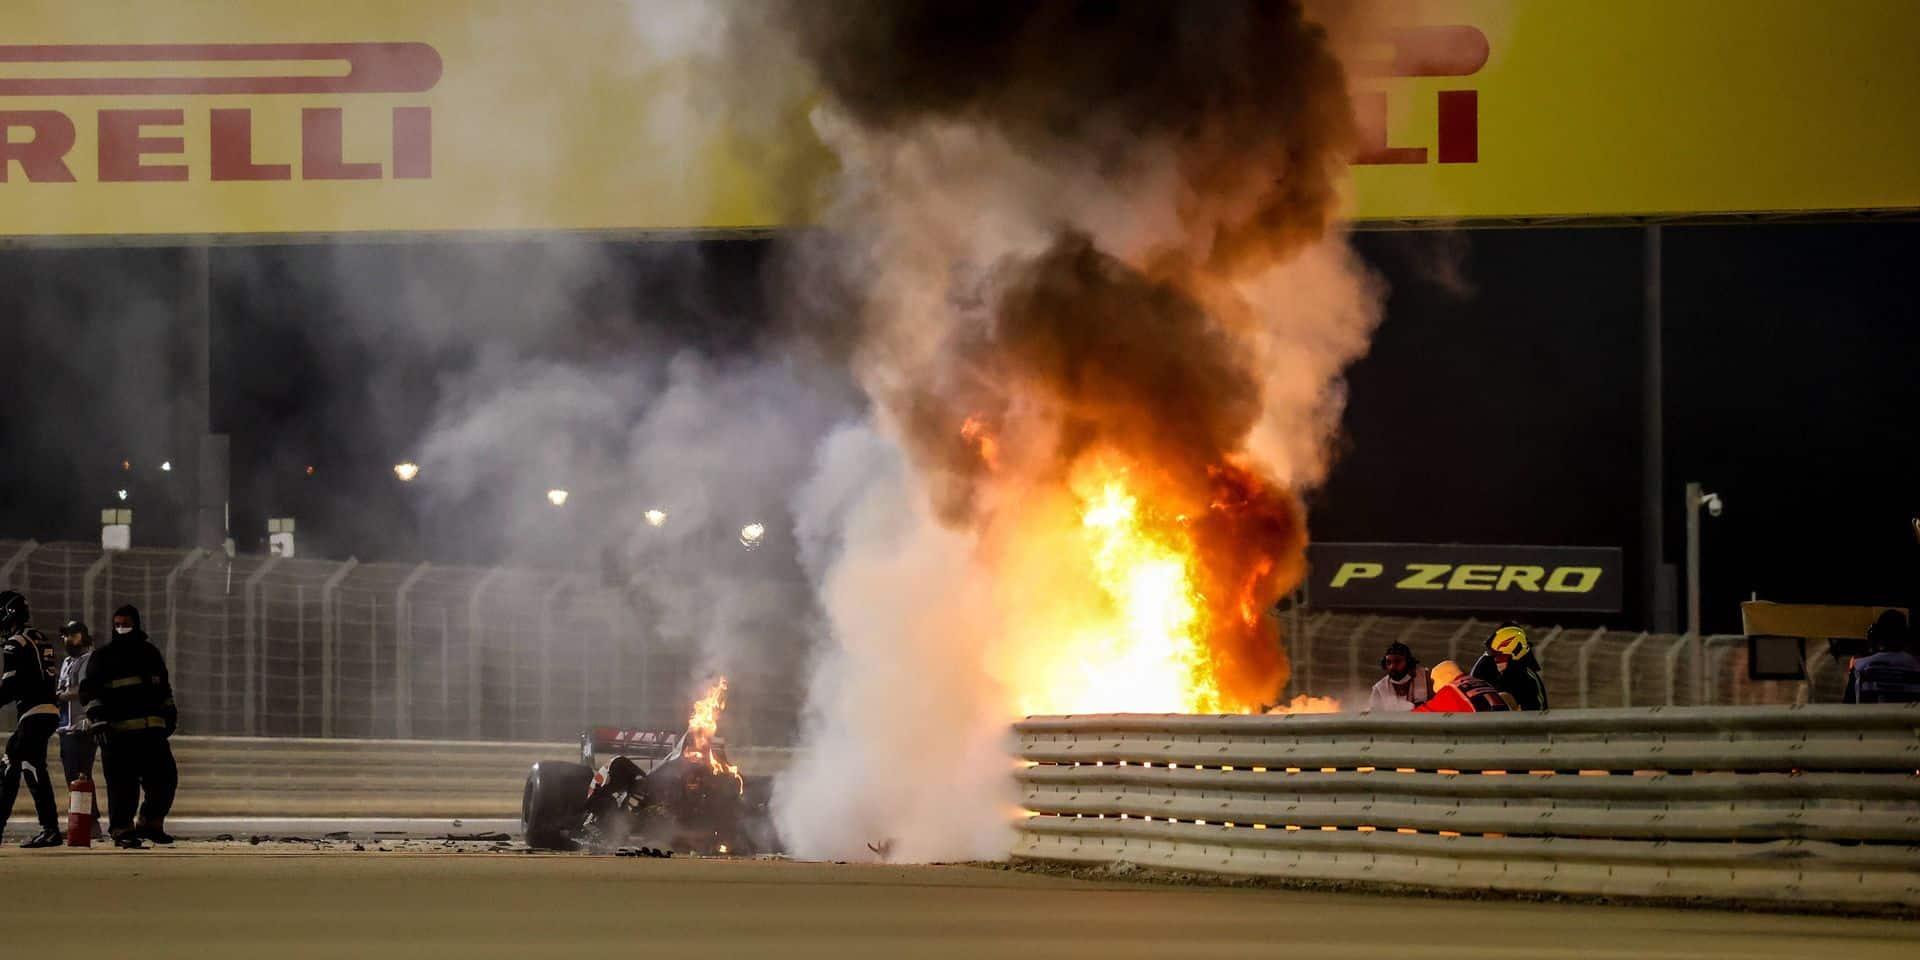 Motorsports: FIA Formula One World Championship, WM, Weltmeisterschaft 2020, Grand Prix of Bahrain, A fire is pictured